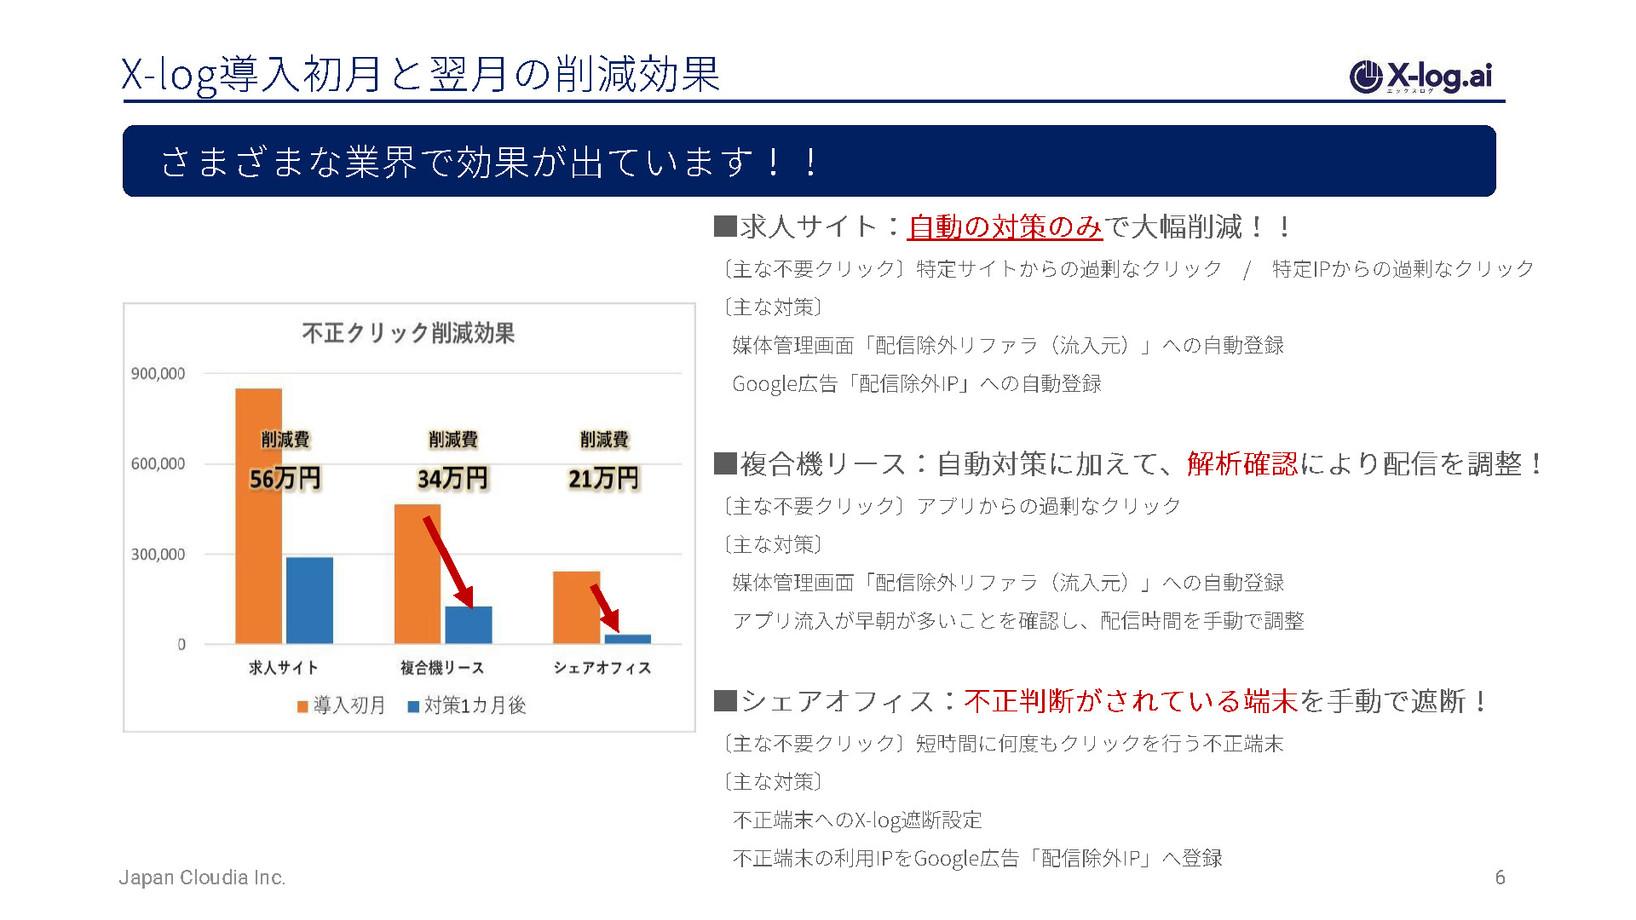 X-log.aiご案内資料_ページ_06.jpg